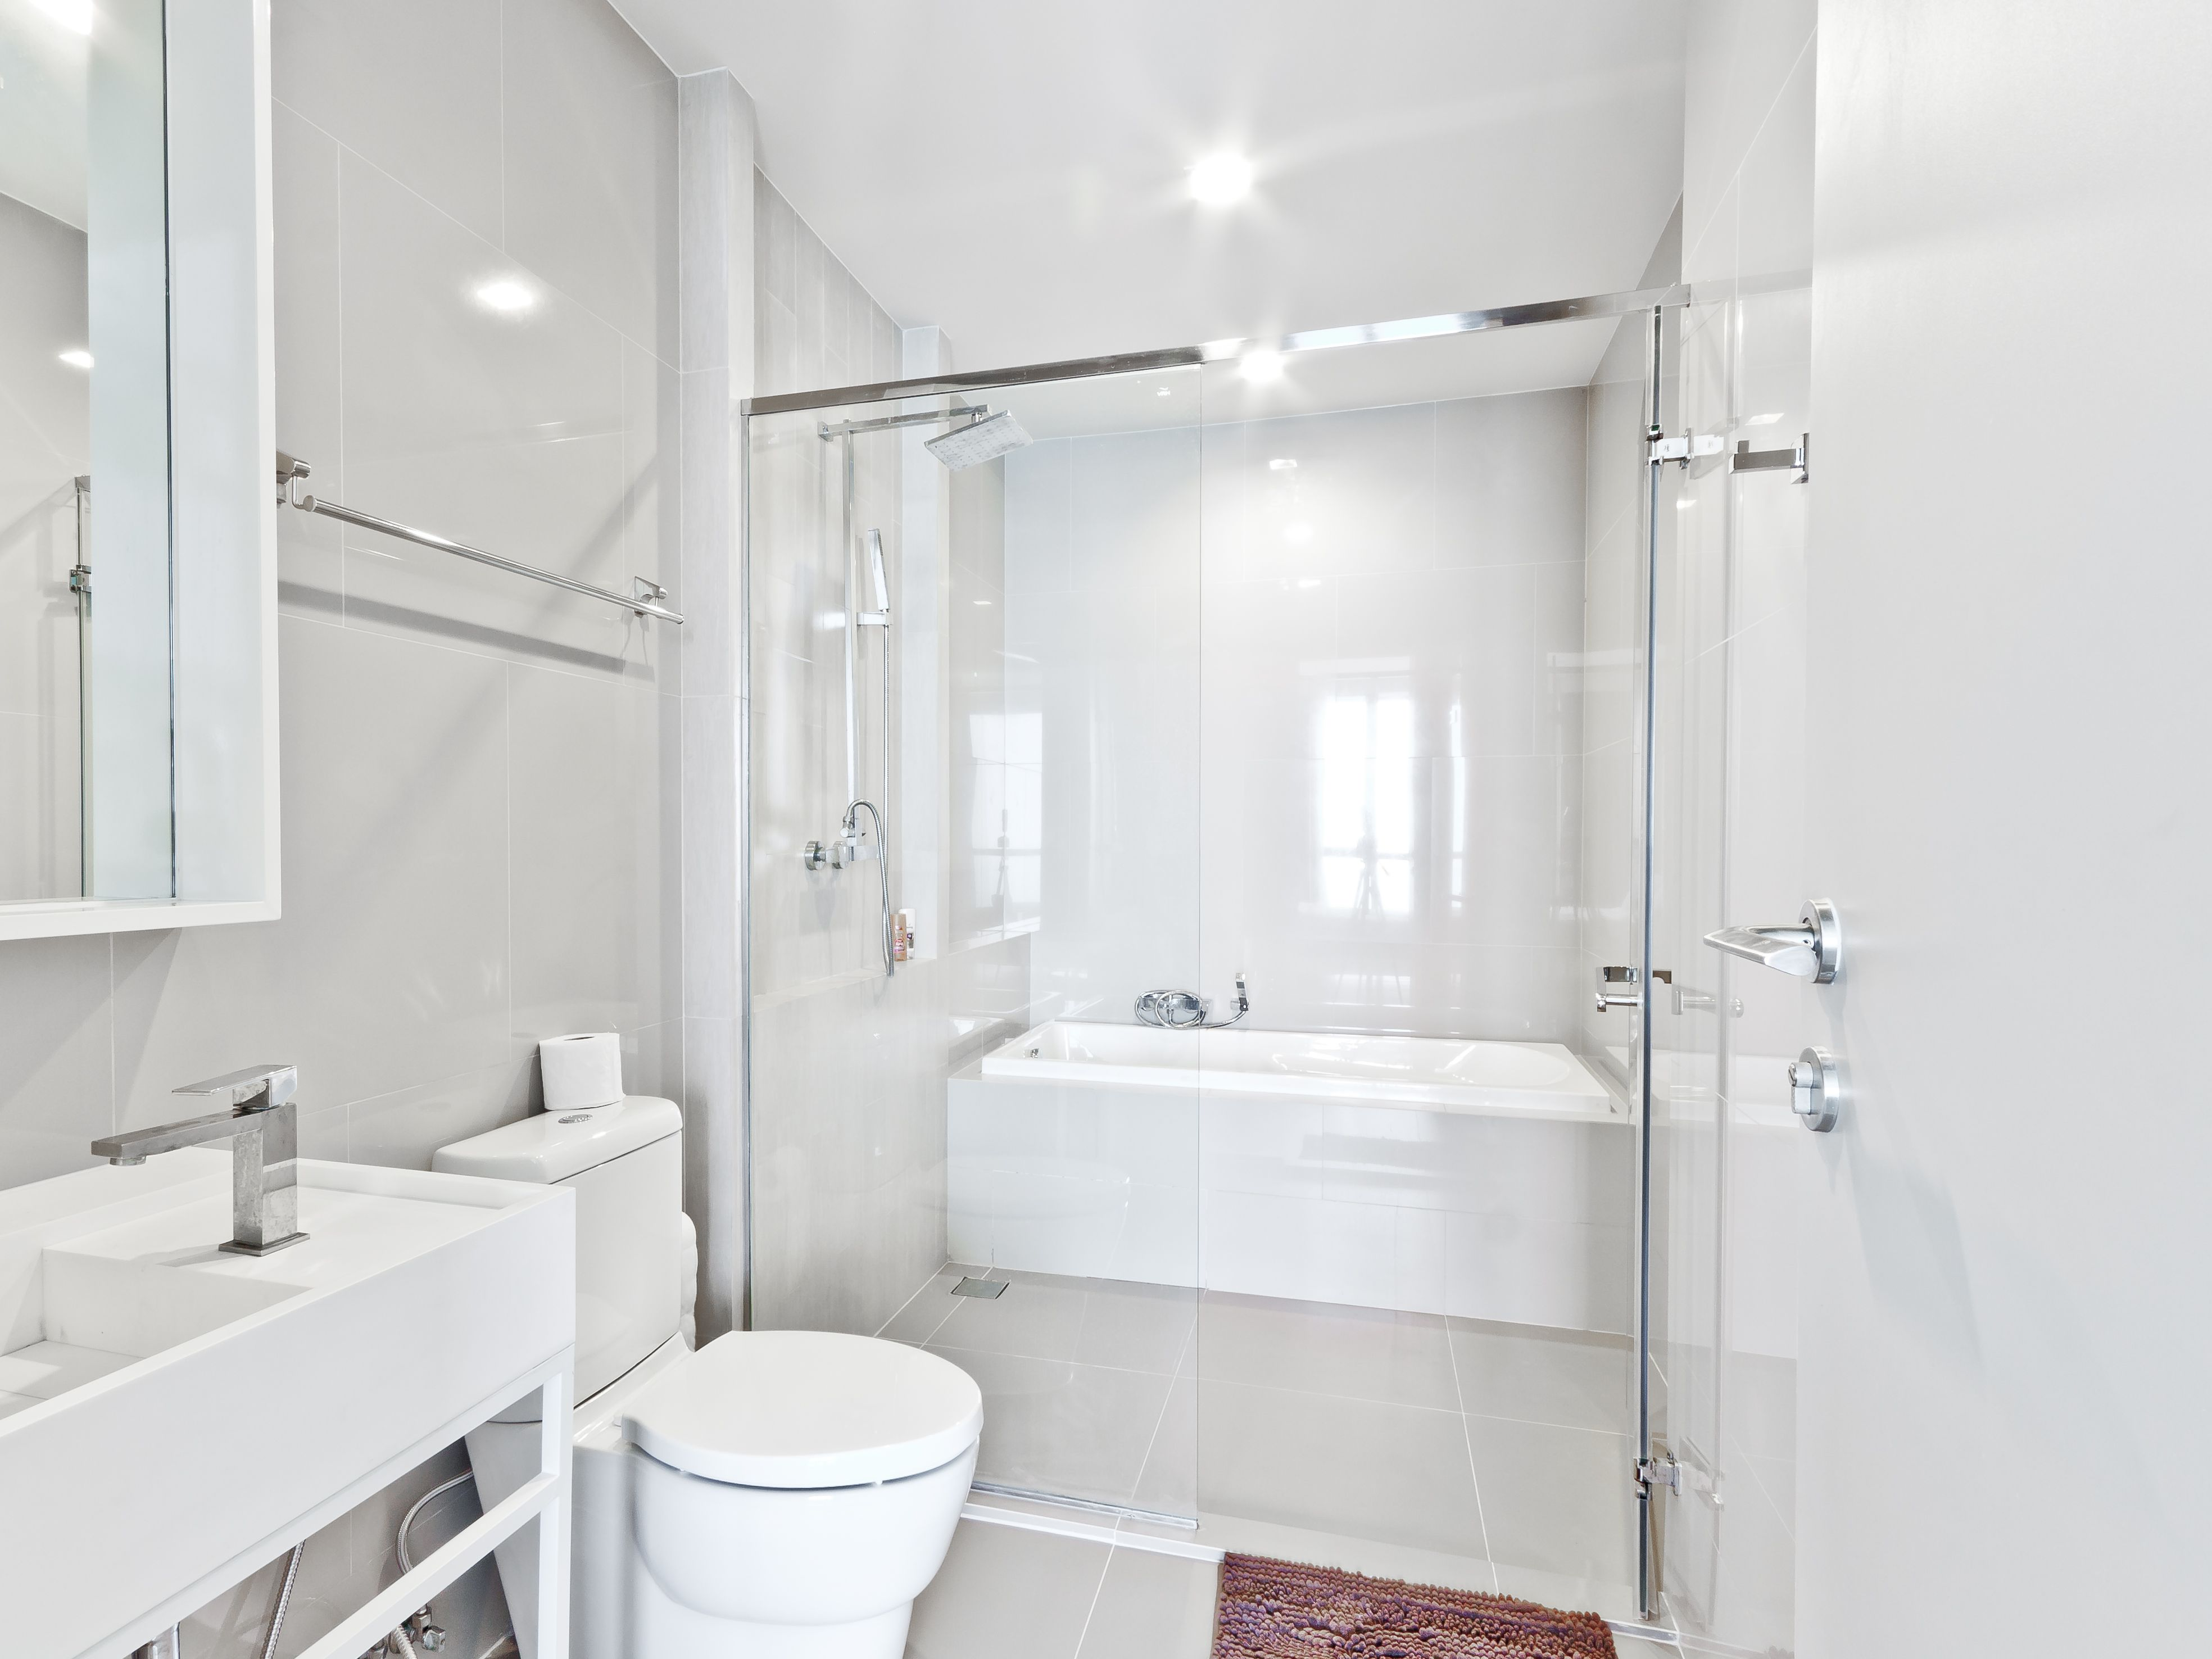 small bathroom design ideas ideas for interior.htm 15 beautiful small bathroom designs  15 beautiful small bathroom designs